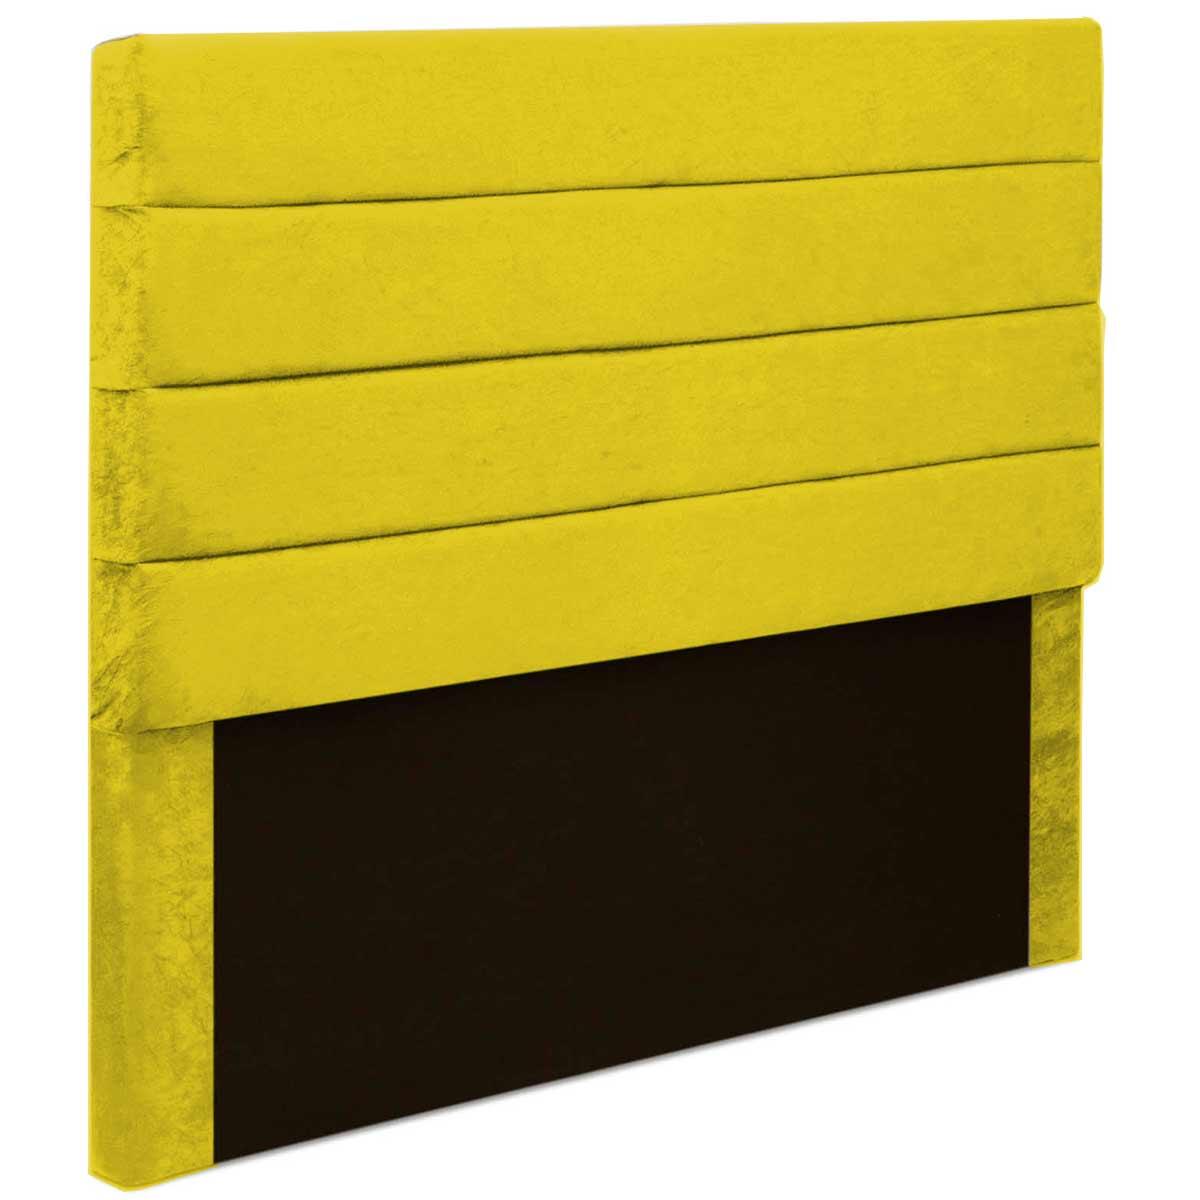 Cabeceira Casal Estofada Argentina 140 cm Animale Amarelo